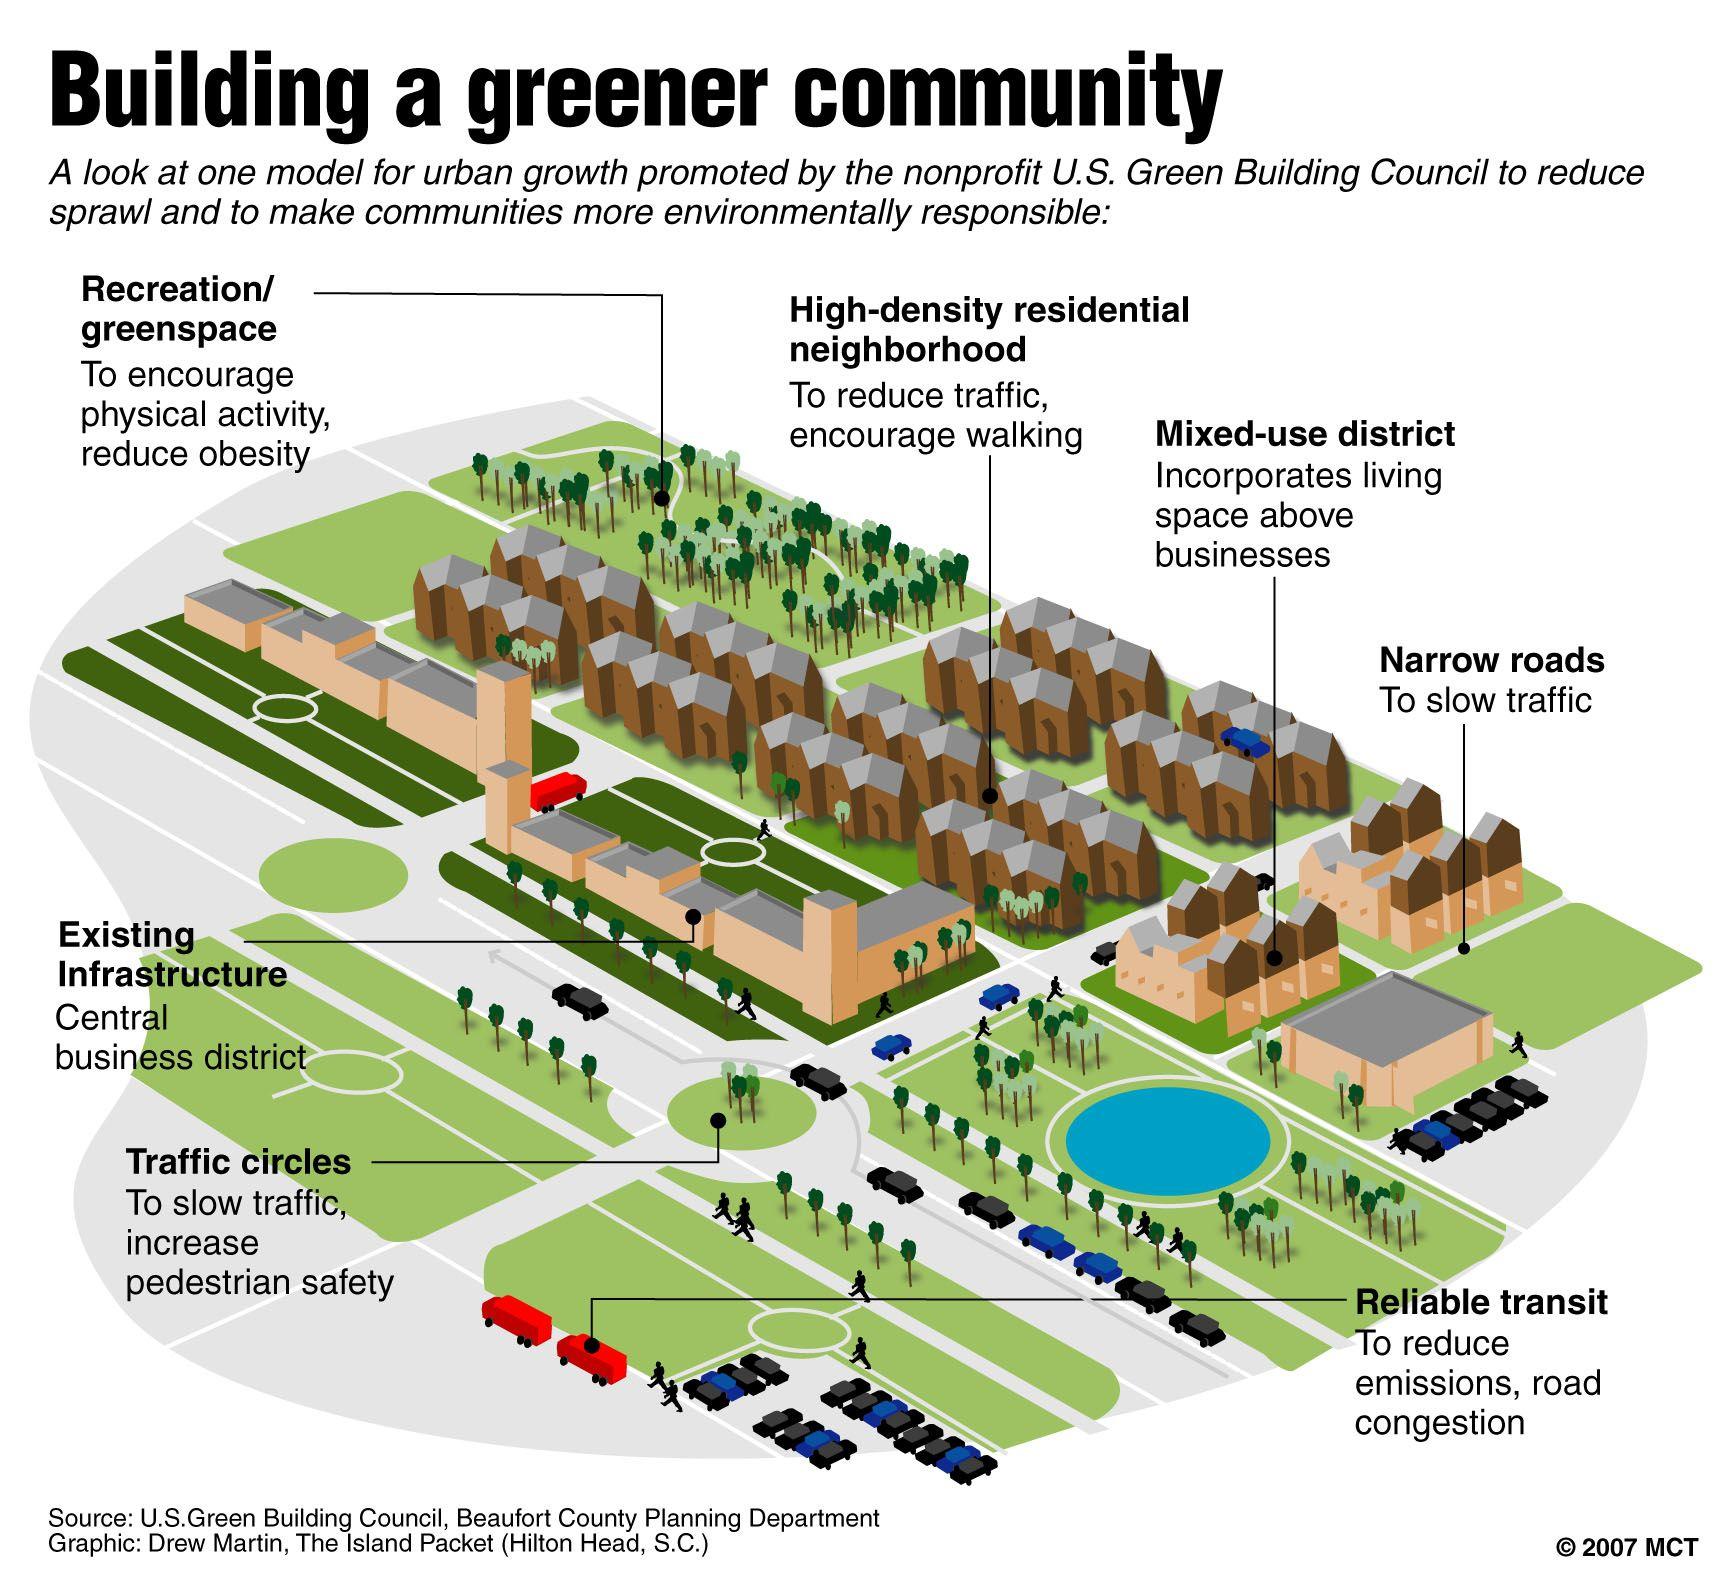 Eco villages newburyport massachusetts urban planning - Sustainable urban planning and design ...